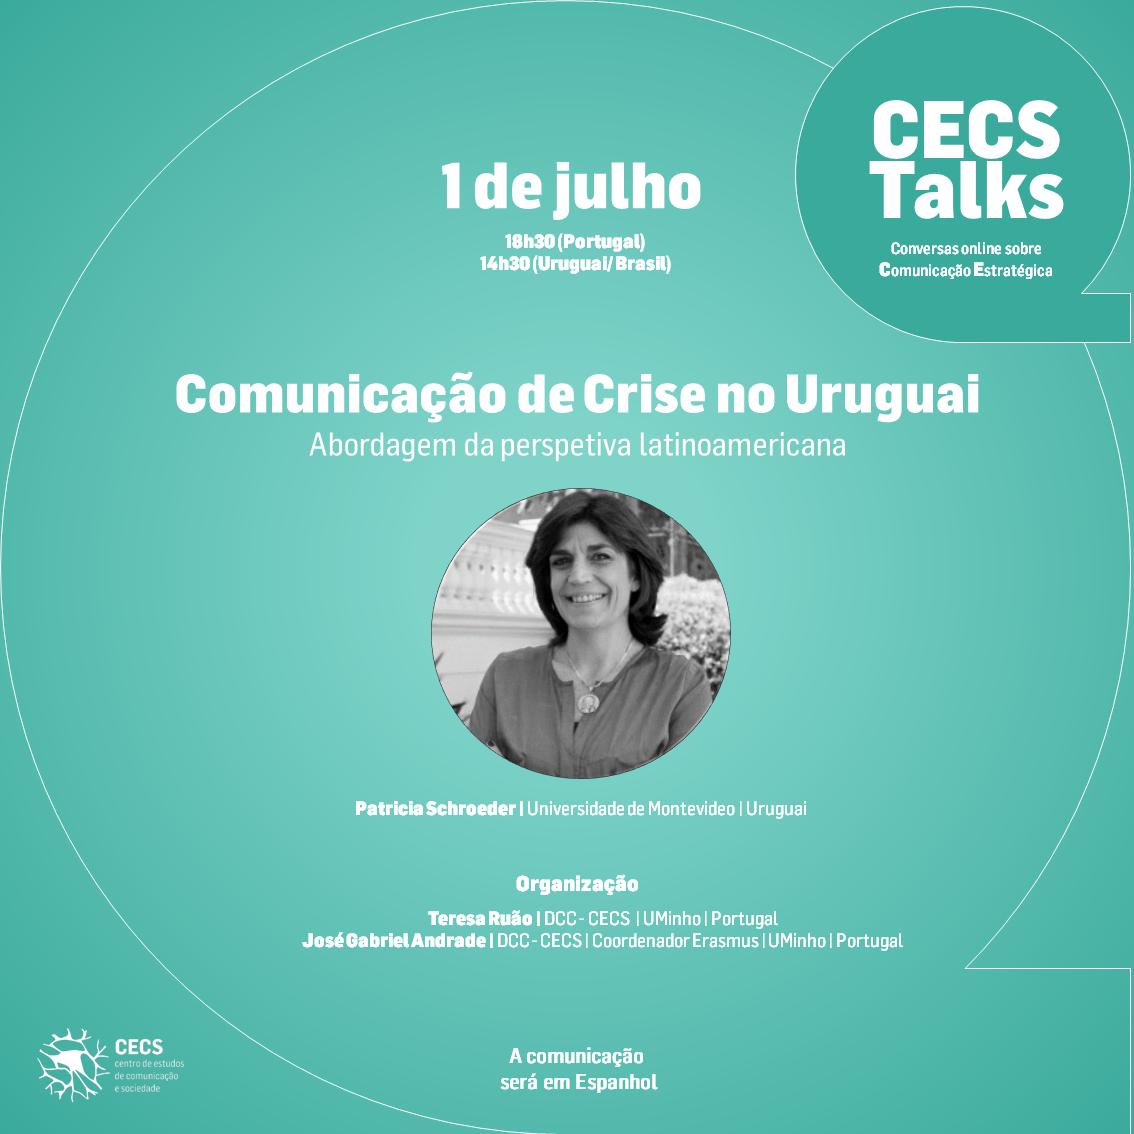 CECS Talks with Patricia Schroeder